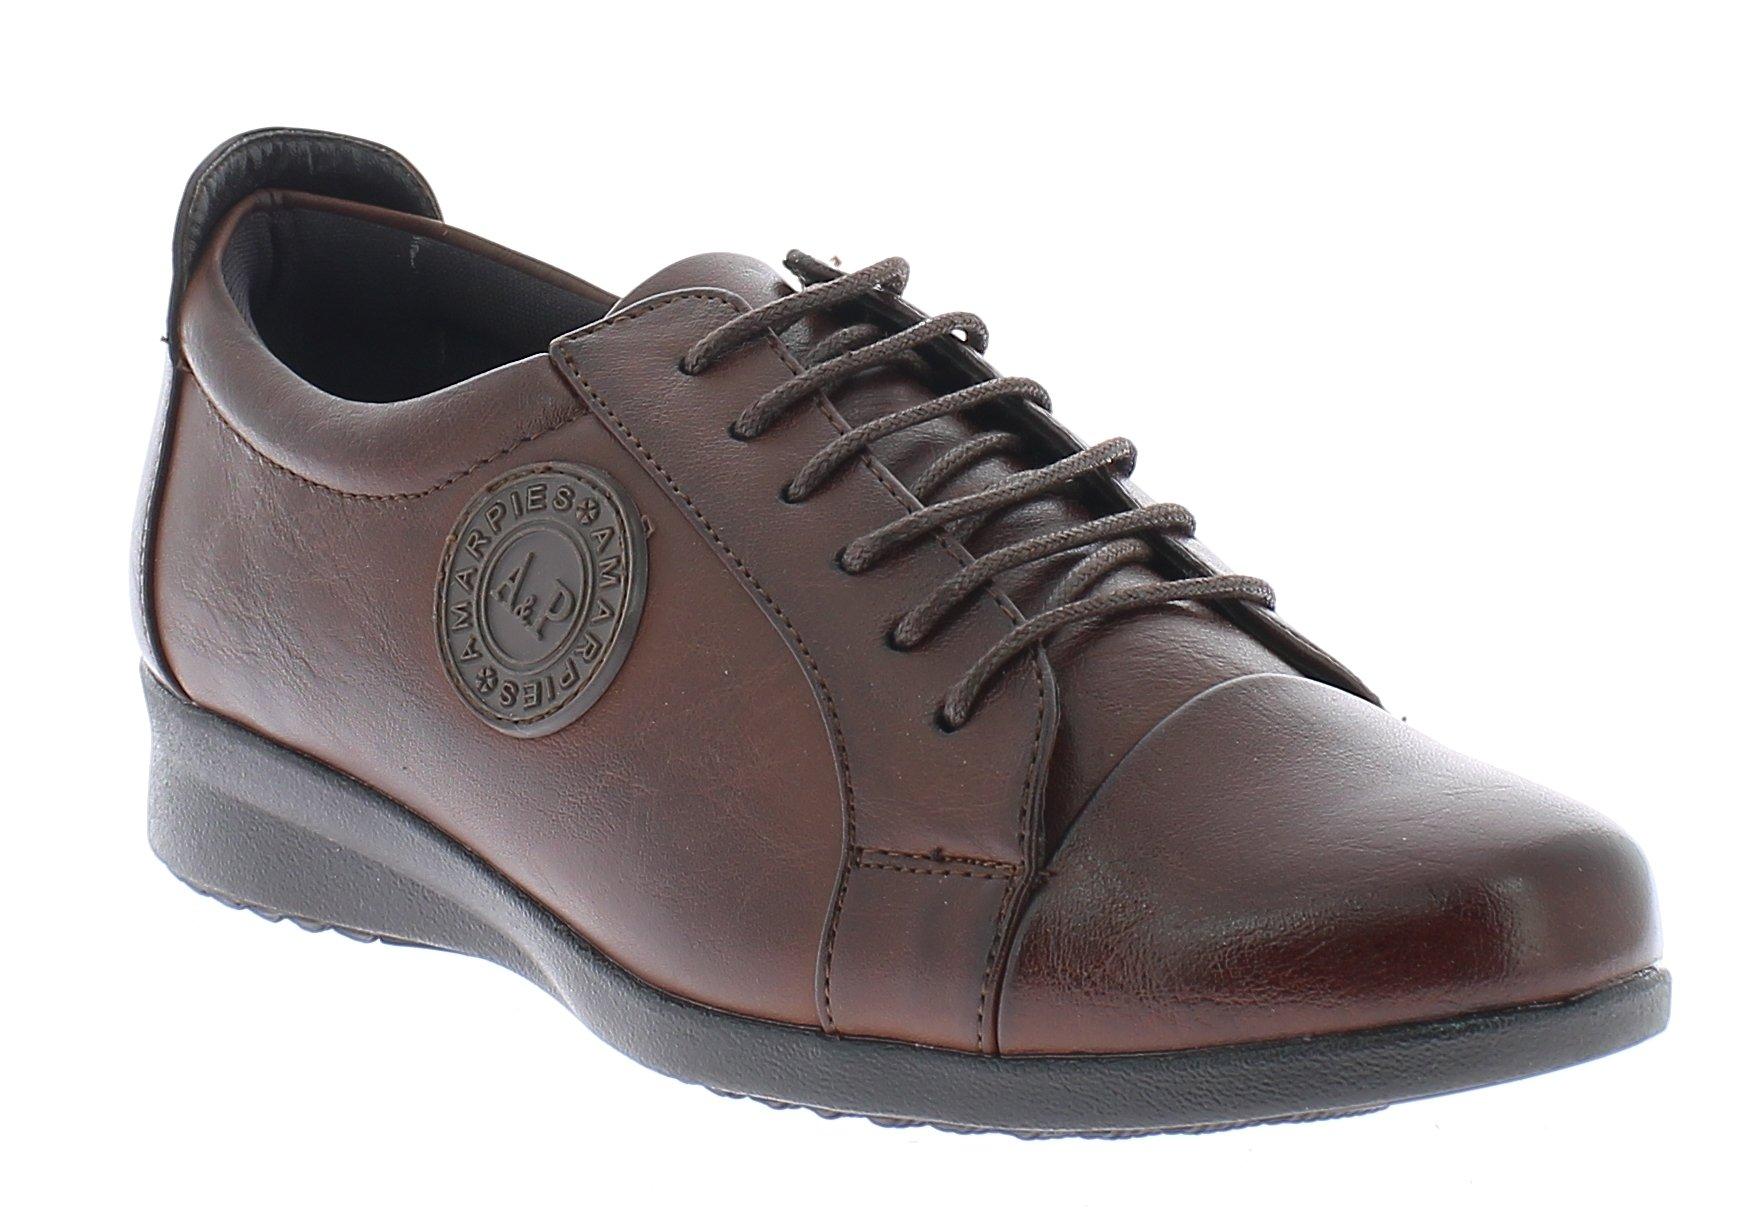 AMARPIES Γυναικεία Comfort AKT9808 Καφέ - IqShoes - AKT9808 BROWN-brown-35/1/24/ προϊόντα παπούτσια